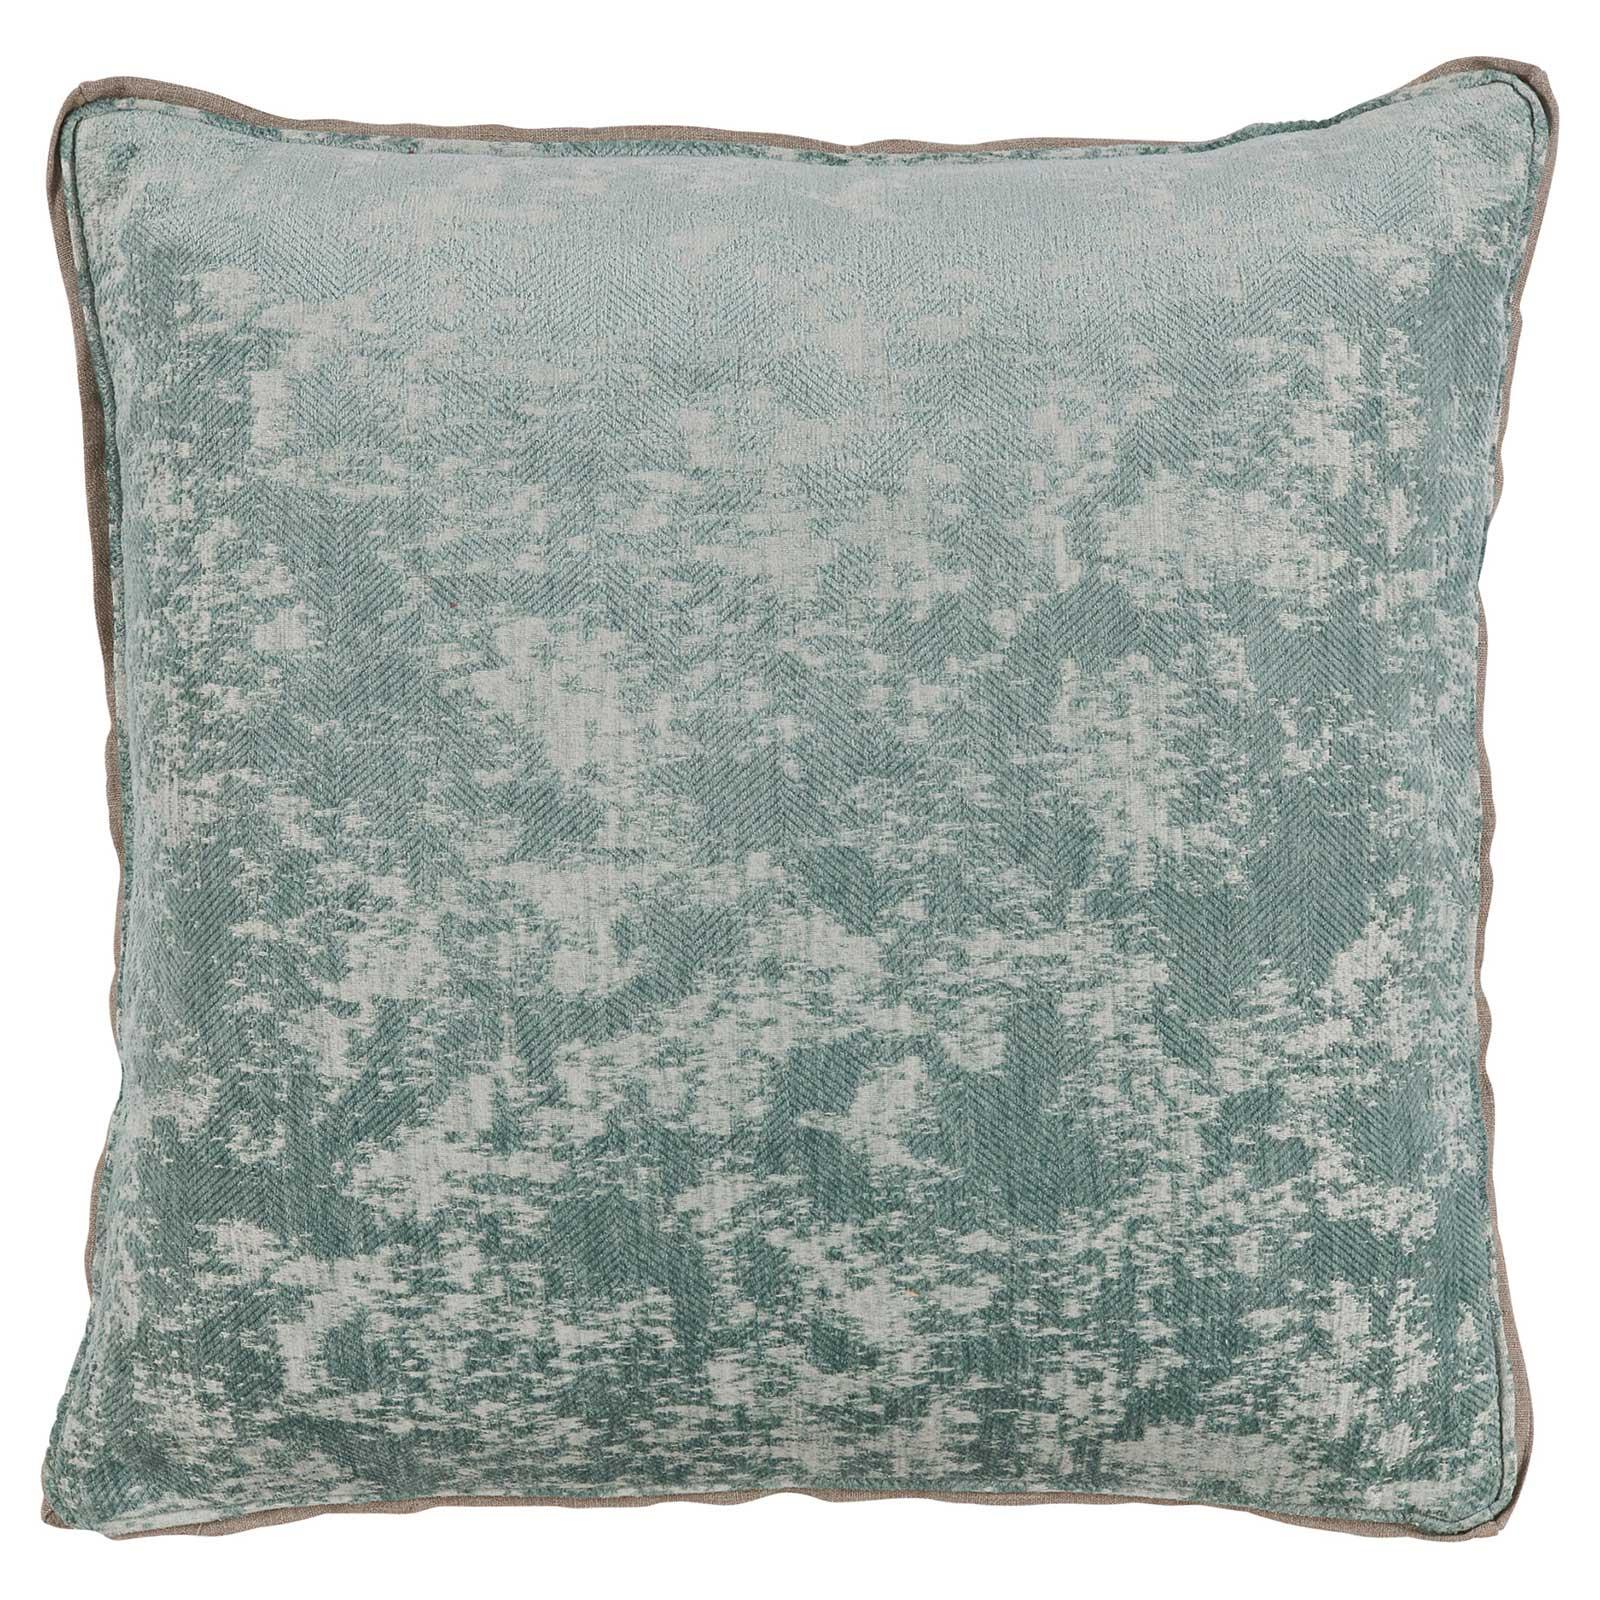 Harriet Regency Washed Herringbone Teal Pillow - 22x22